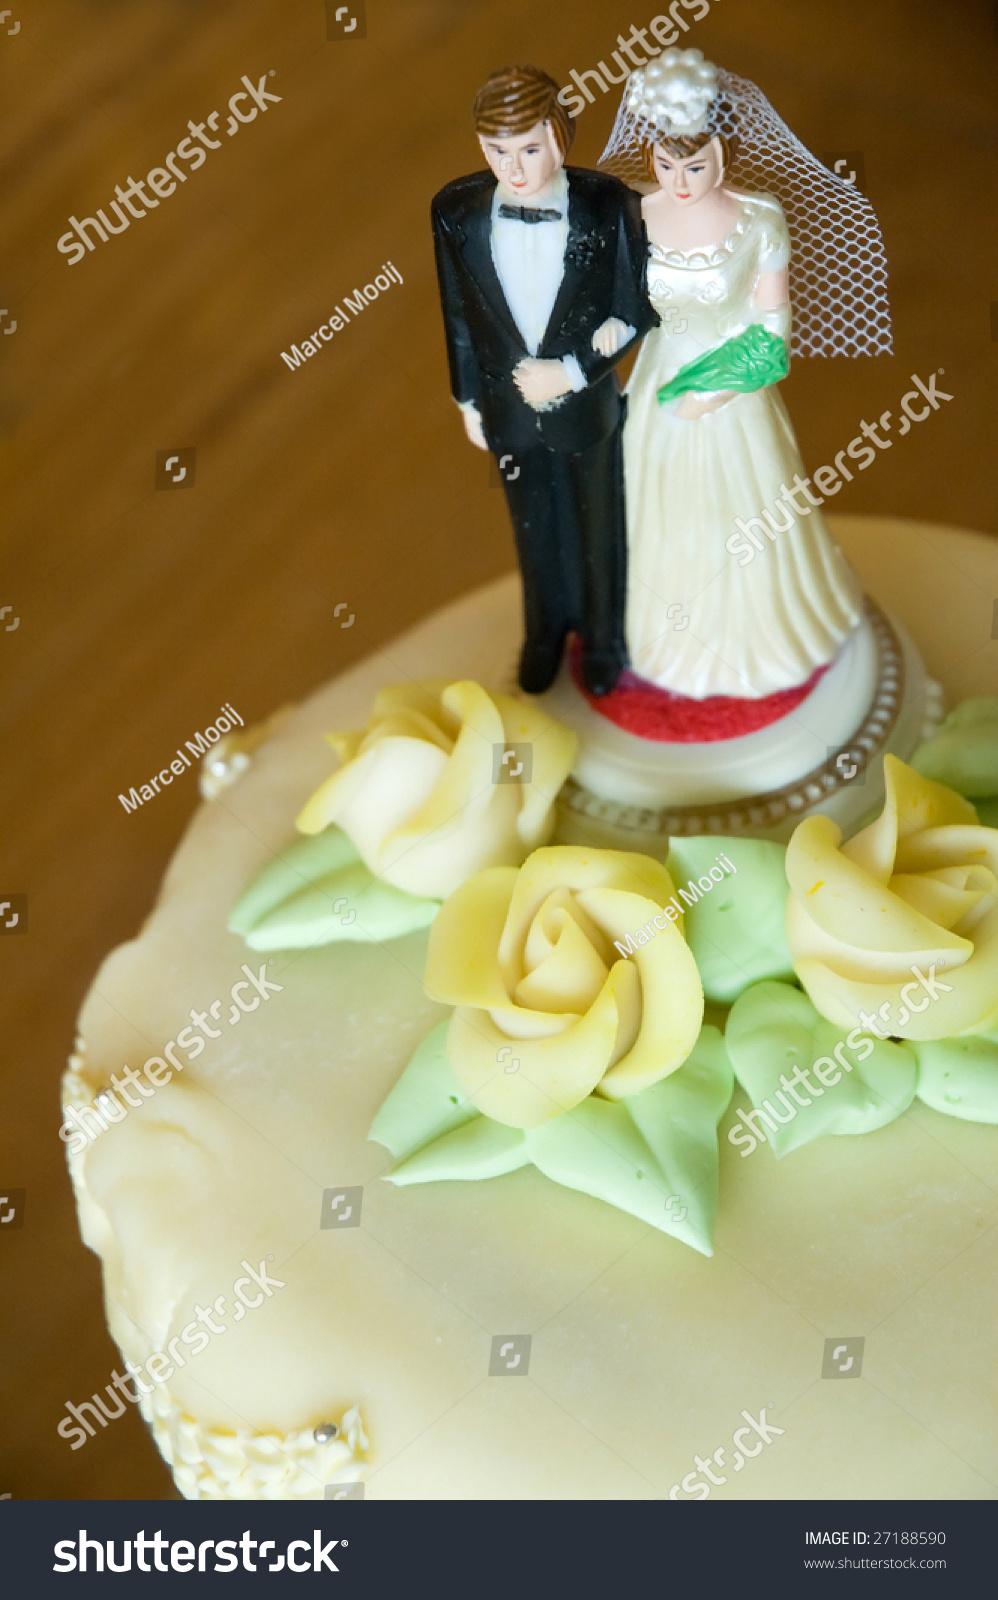 Traditional Bride Groom Figures On Wedding Stock Photo (Royalty Free ...